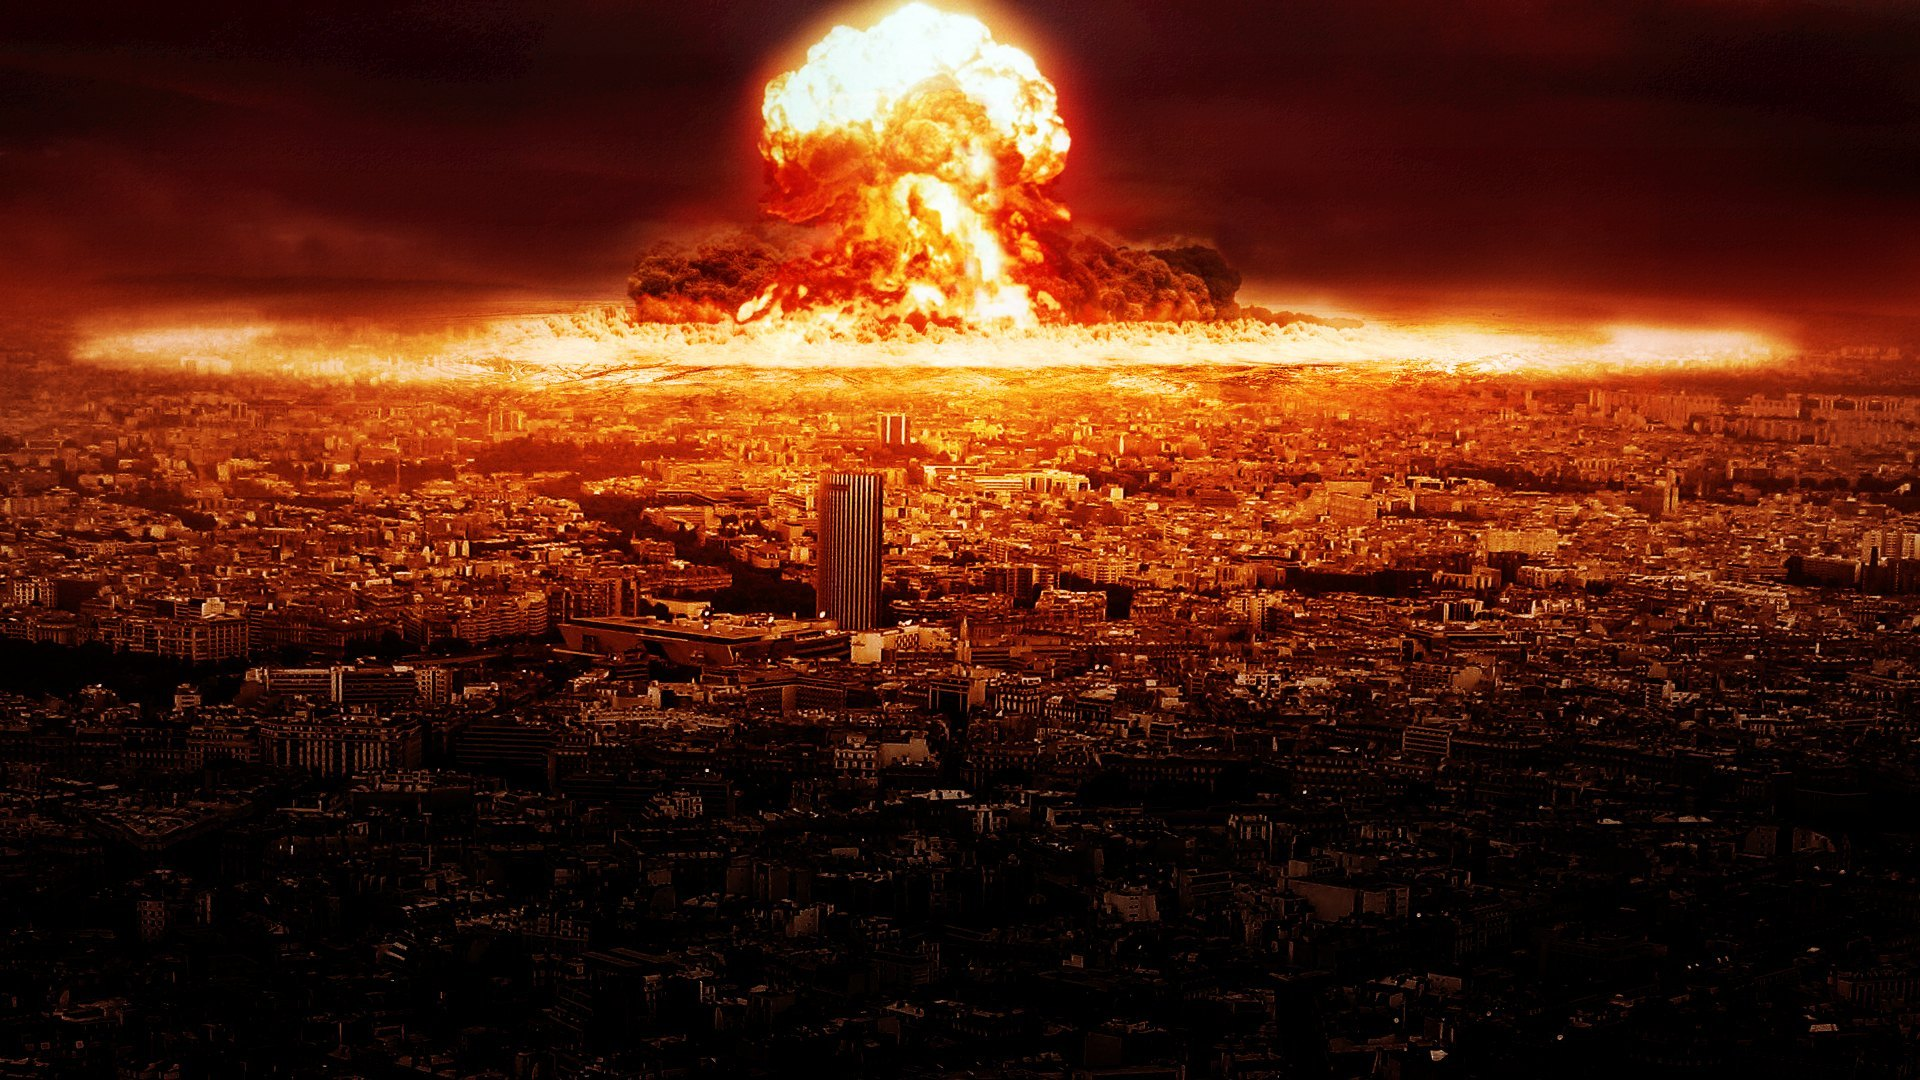 Nuclear Explosion 1920x1080